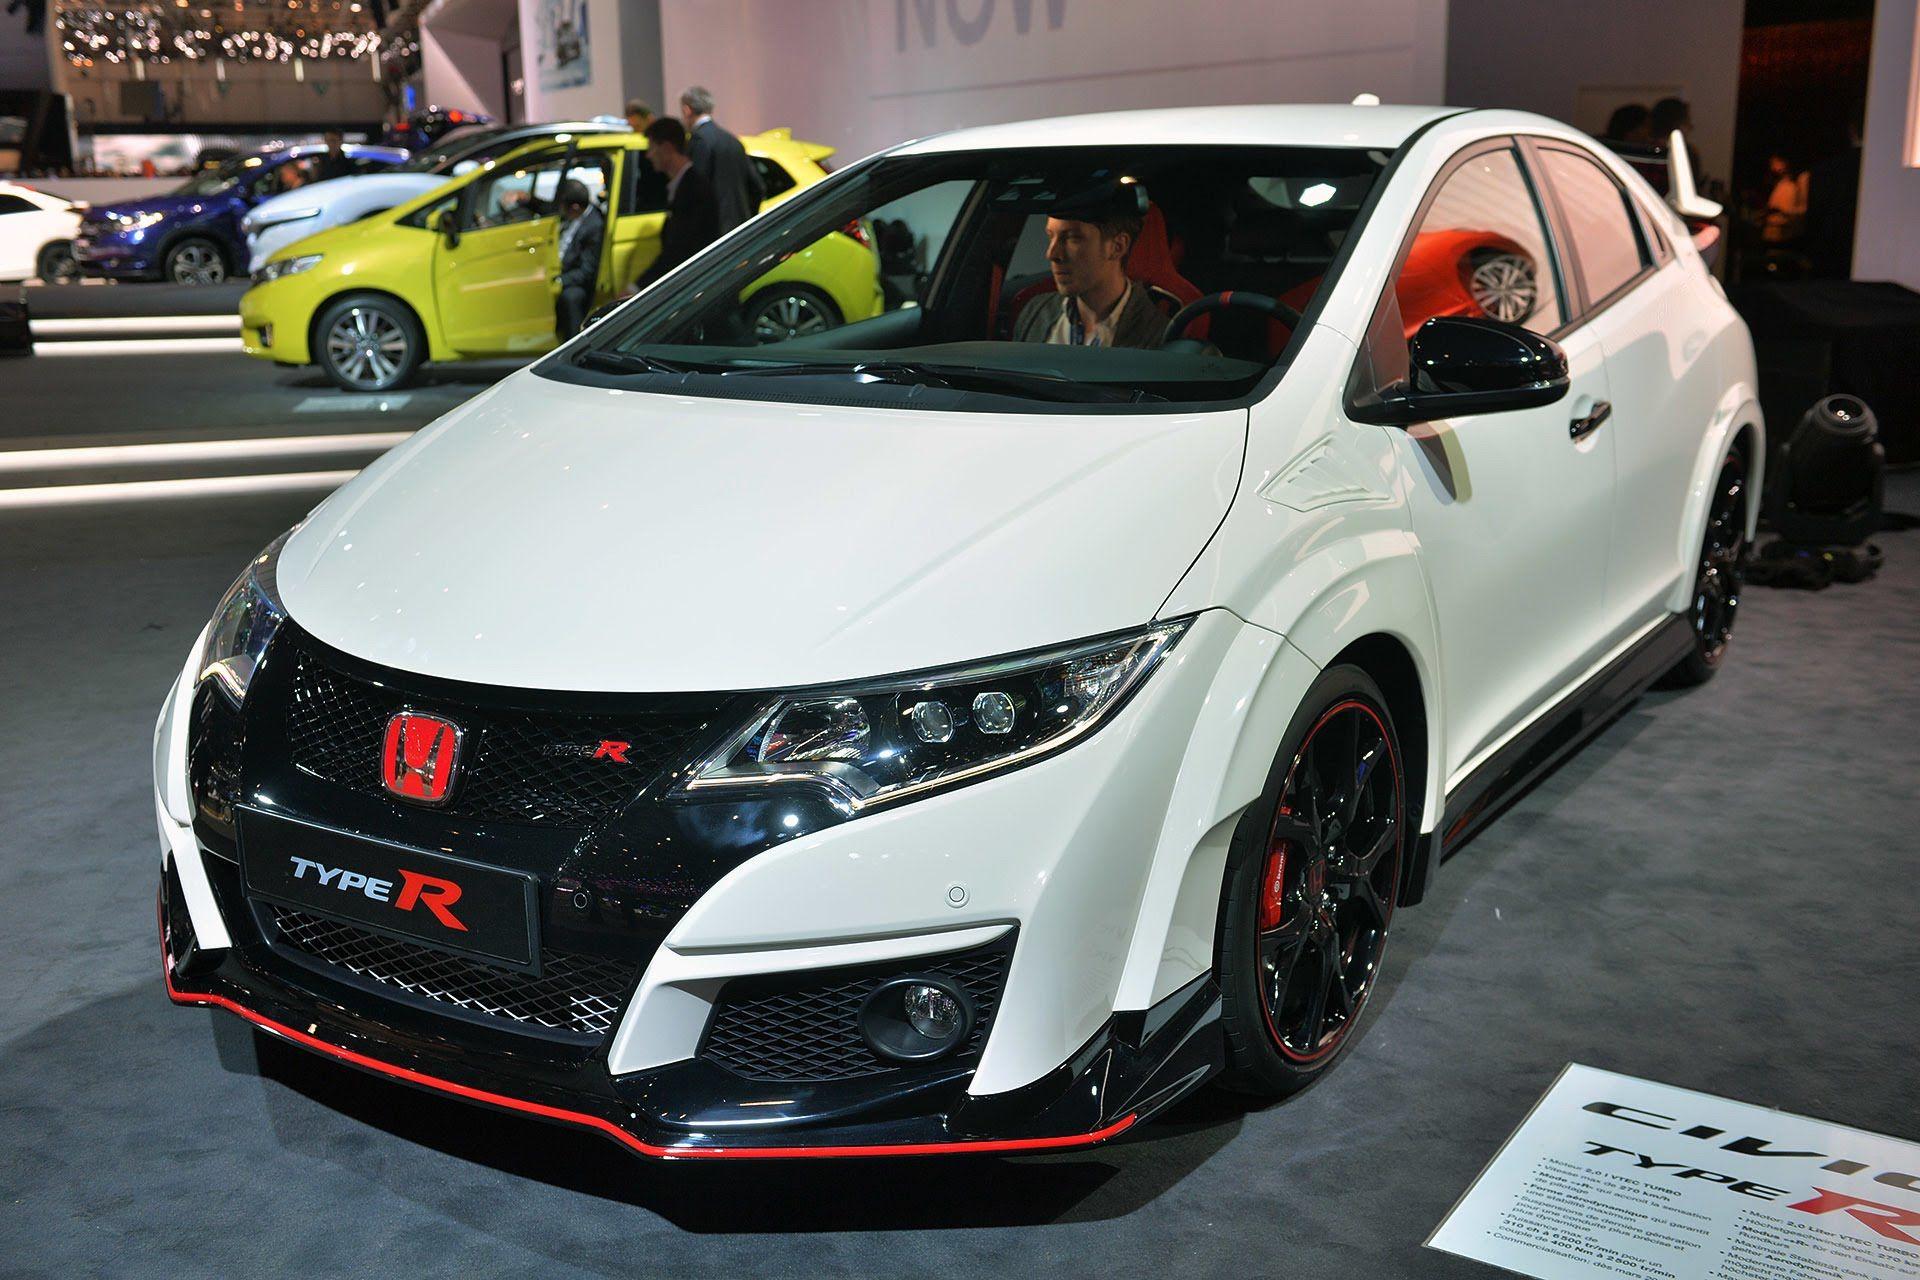 2016 Honda Civic Type R 2015 Geneva Motor Show